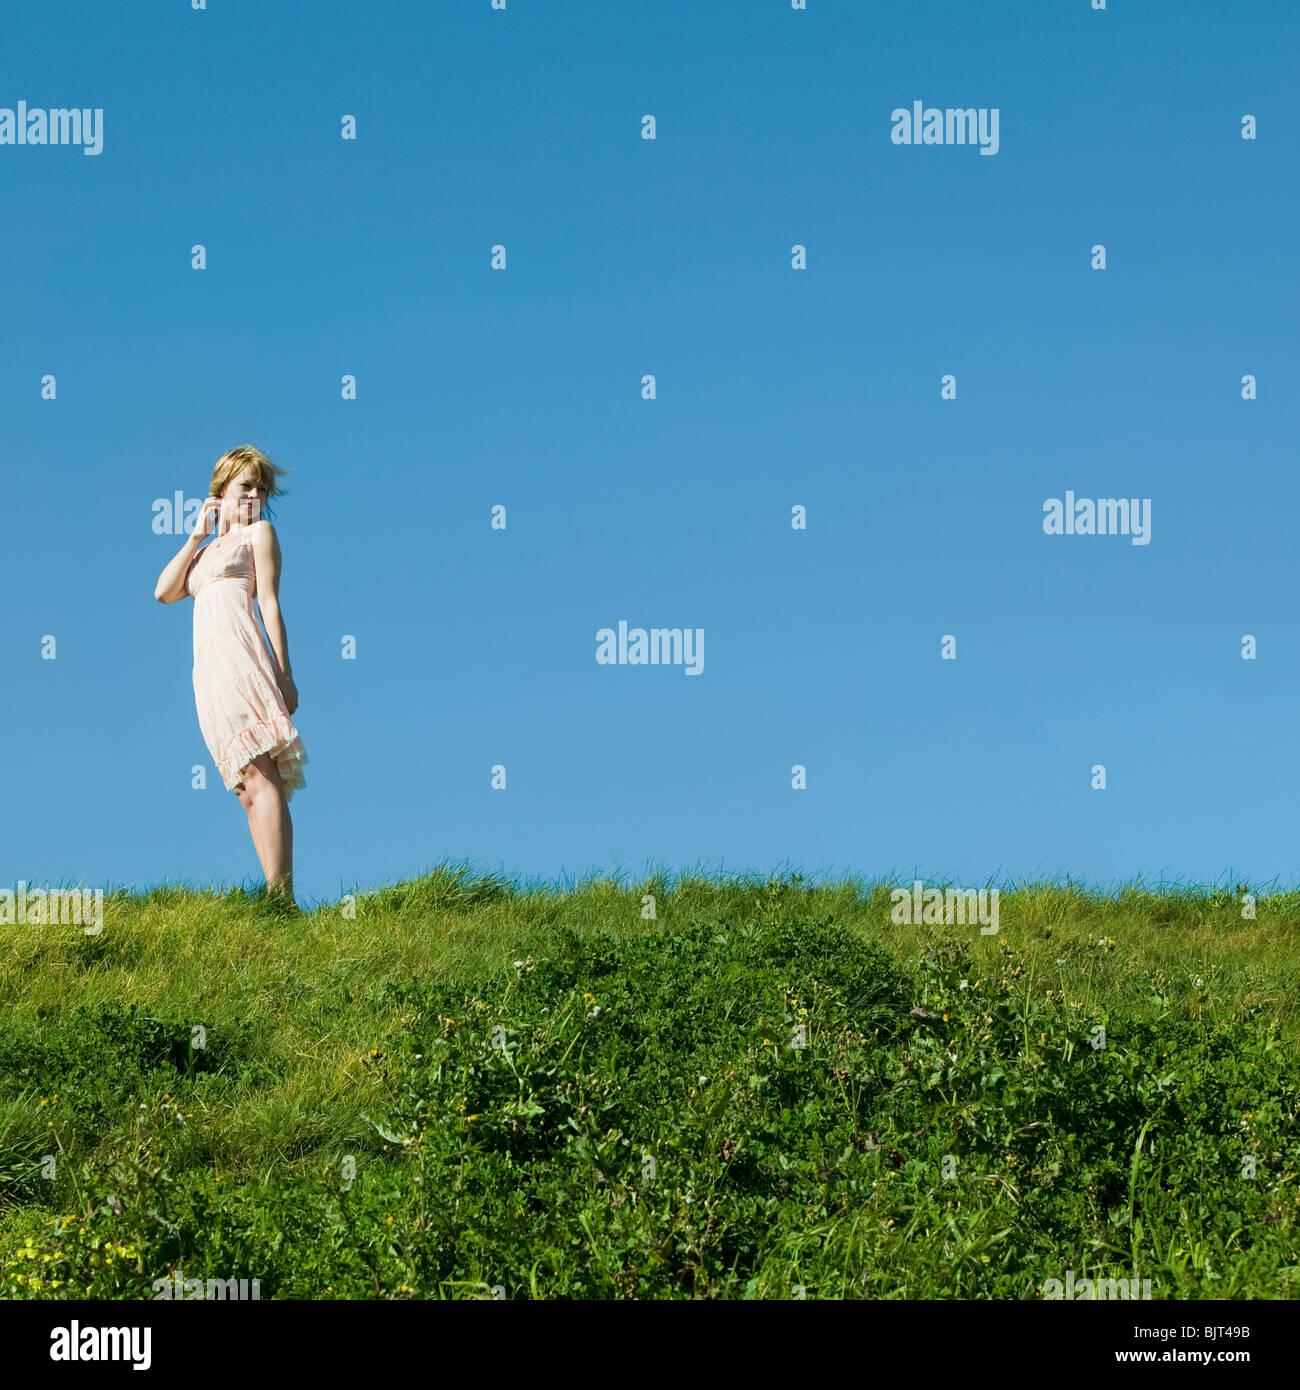 USA, California, San Francisco, young woman standing on grass - Stock Image